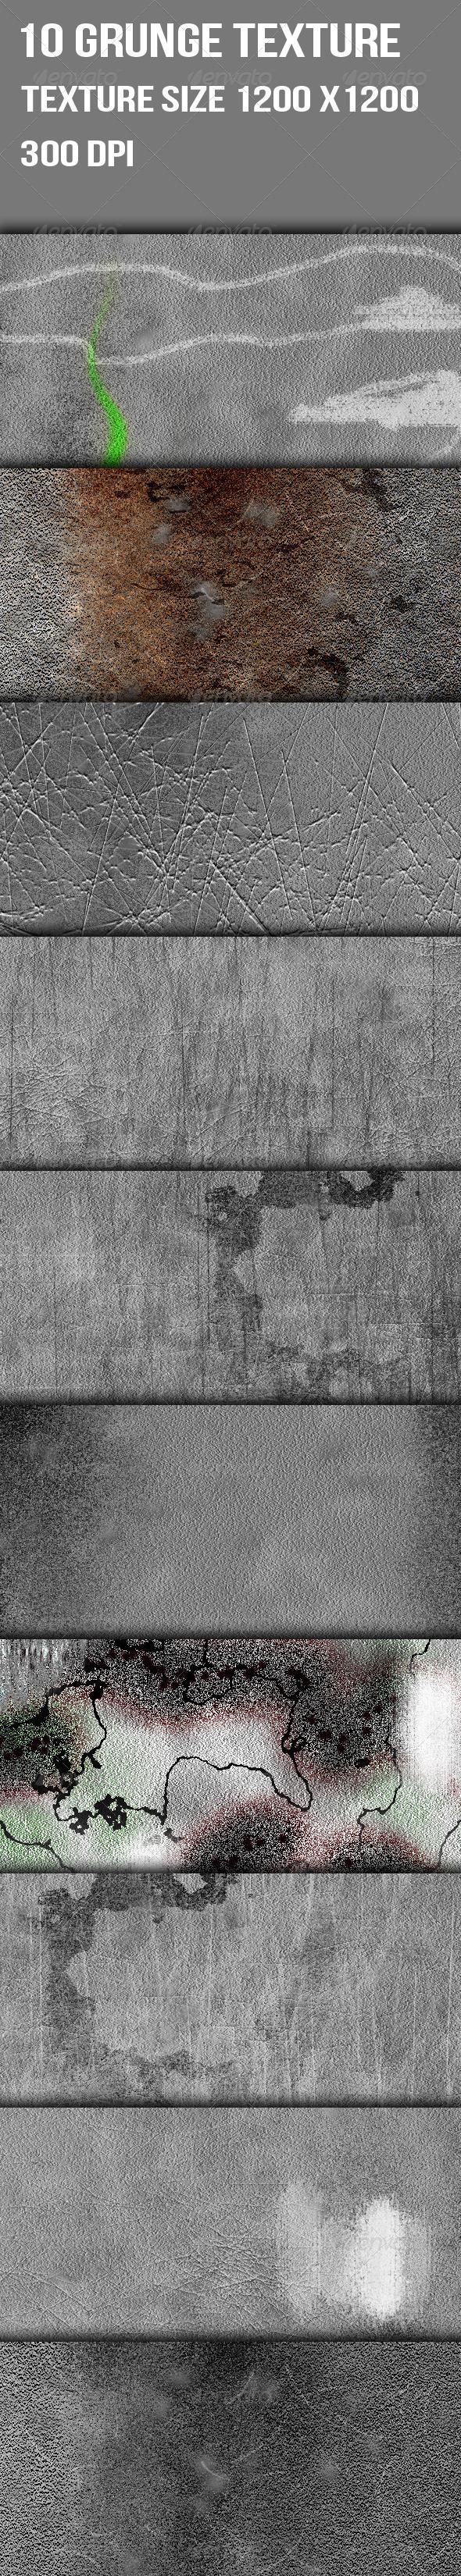 GraphicRiver Grunge Texture 4974907